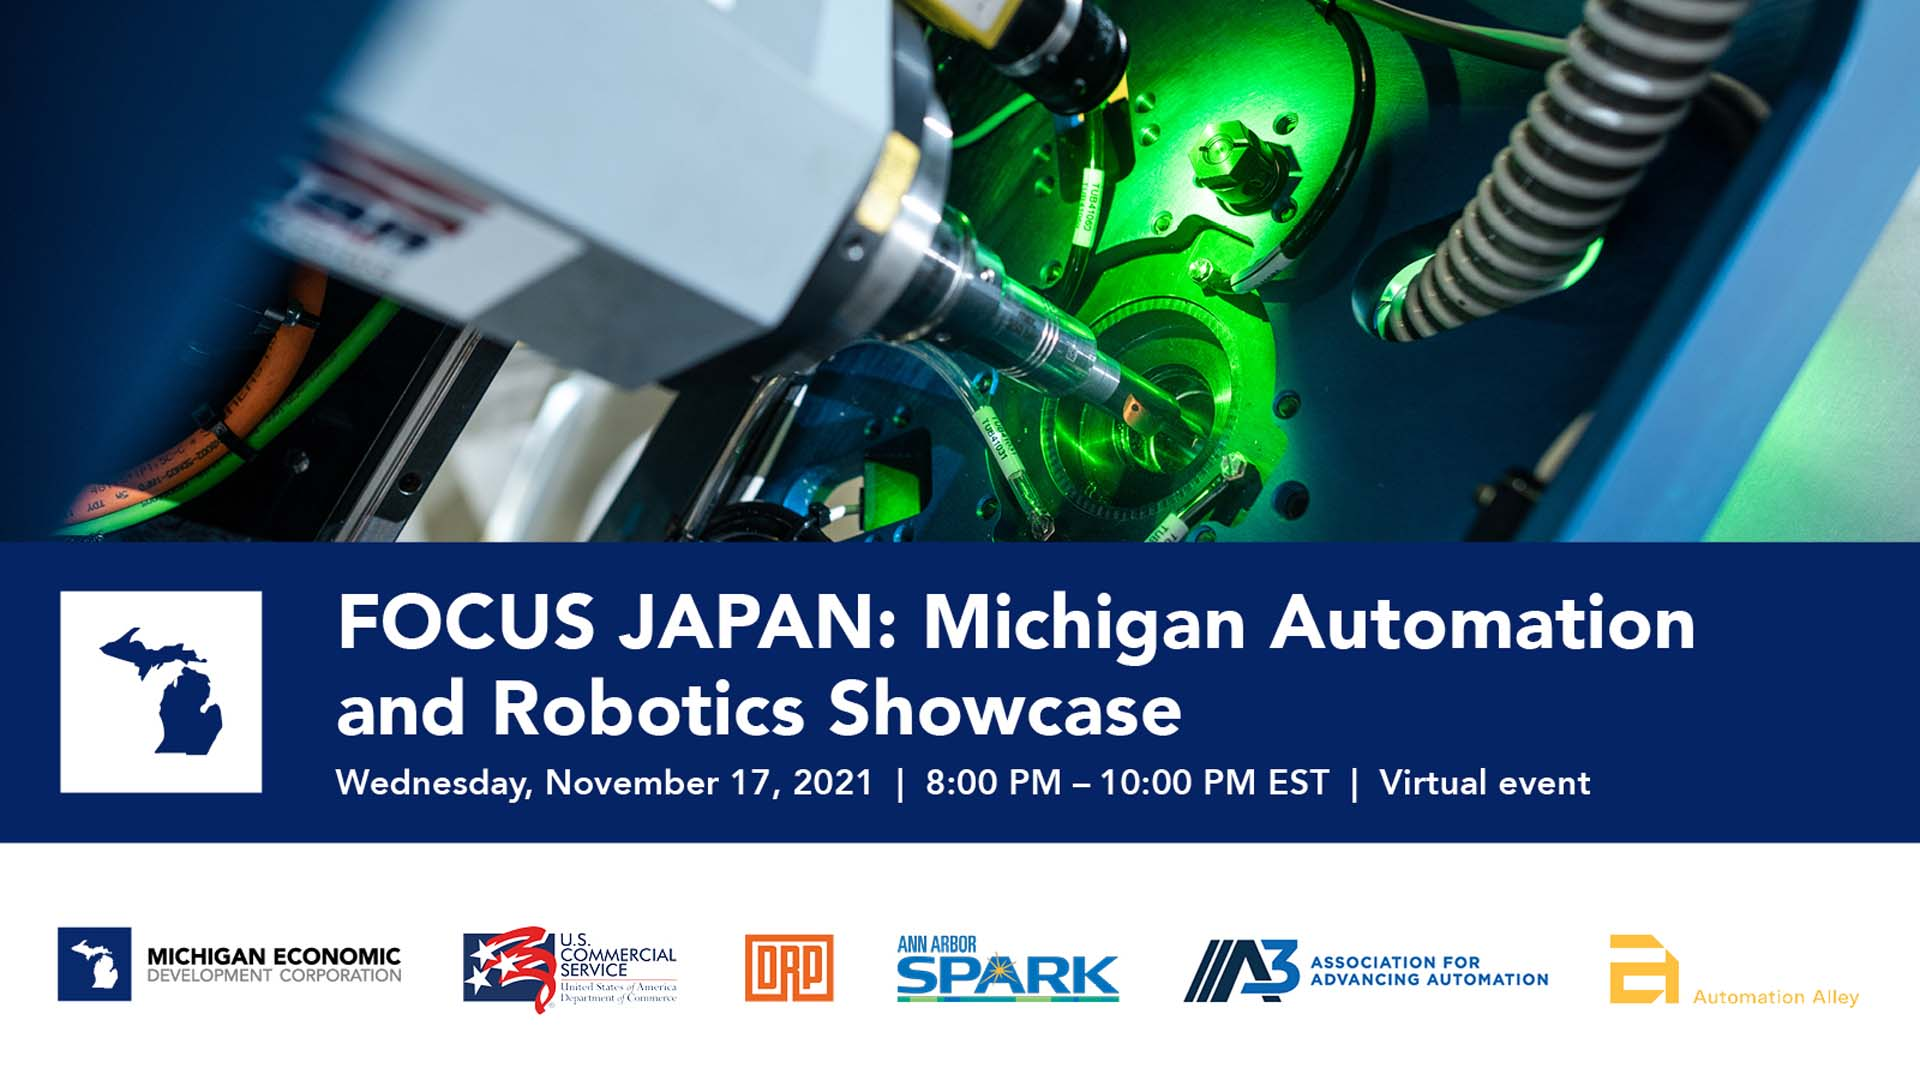 FOCUS JAPAN: Michigan Automation and Robotics Showcase